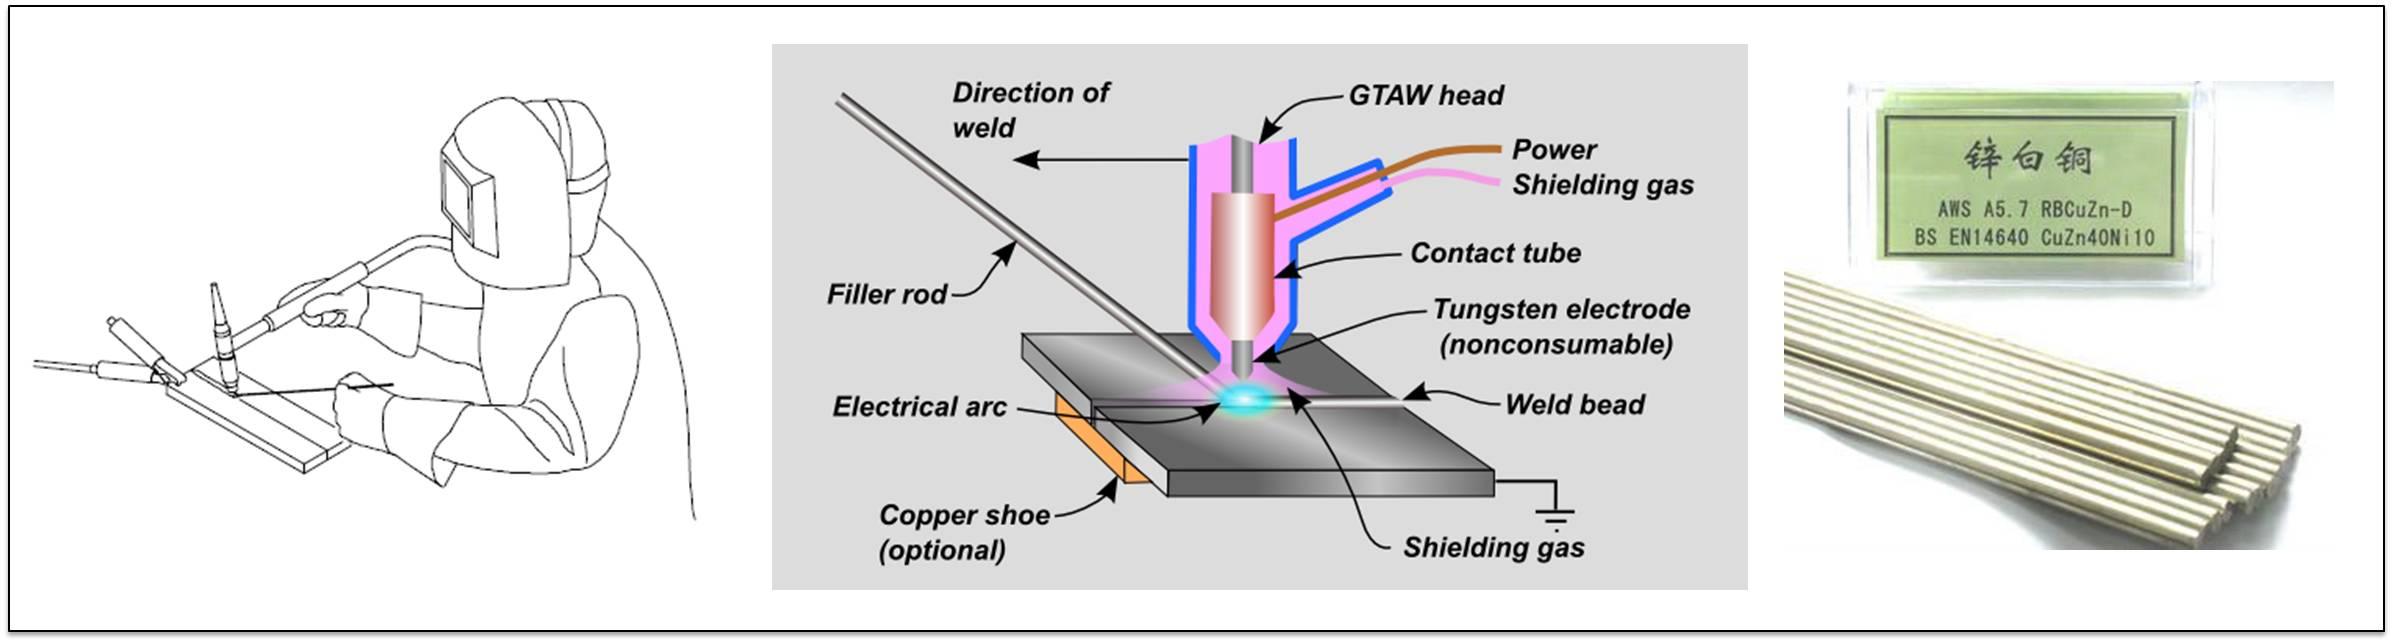 Welding Inspection Mande Blog Plant Diagram Gtaw 2